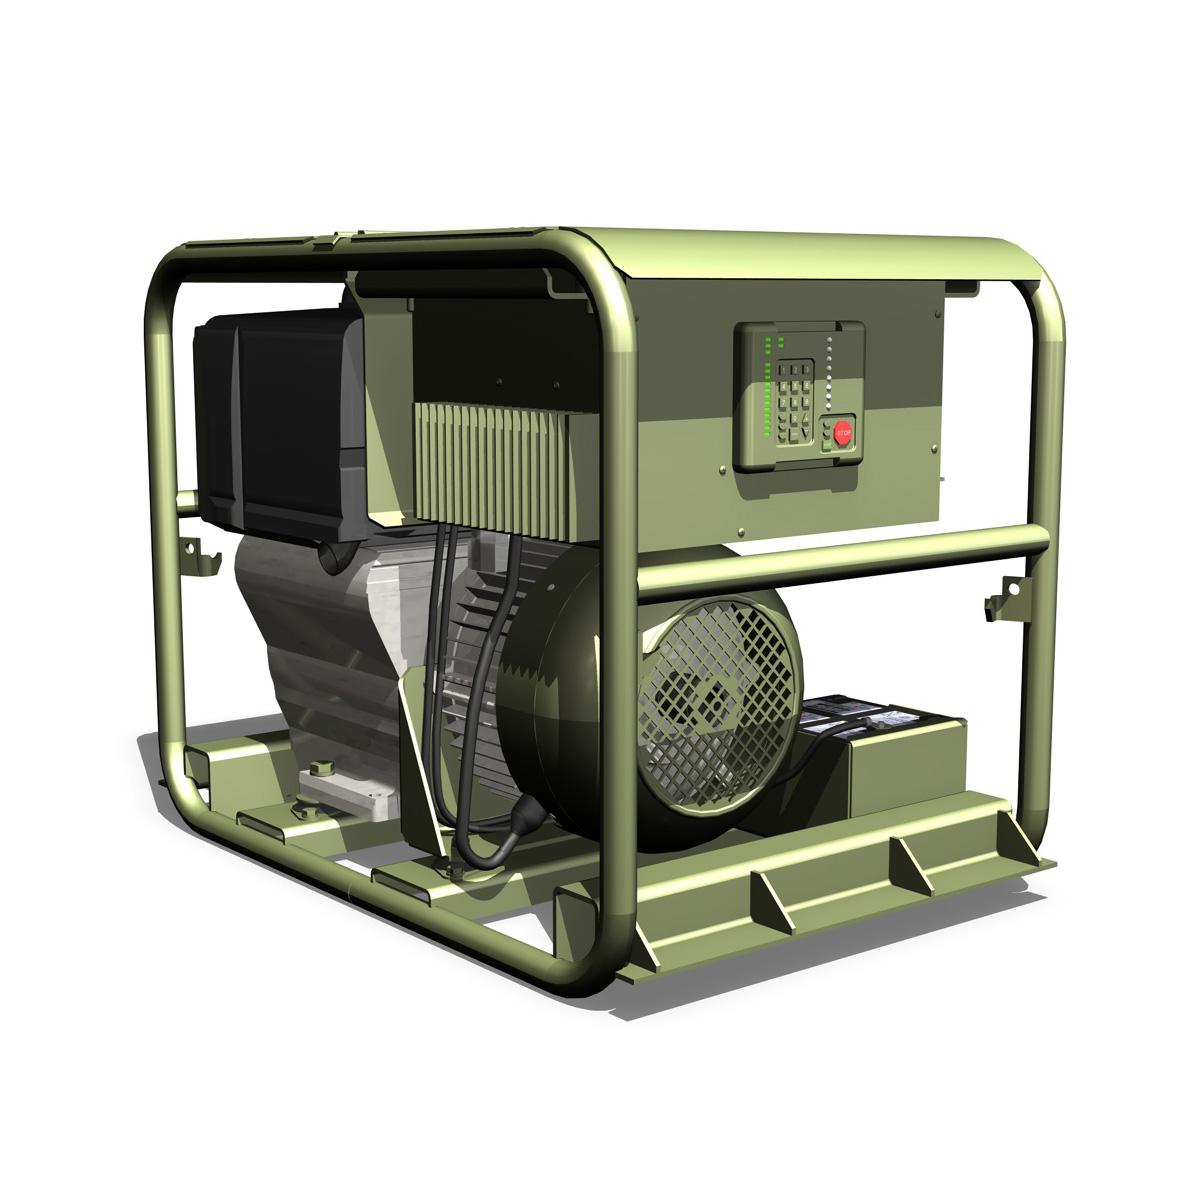 military diesel generator 3d model 3ds fbx c4d lwo obj 188559